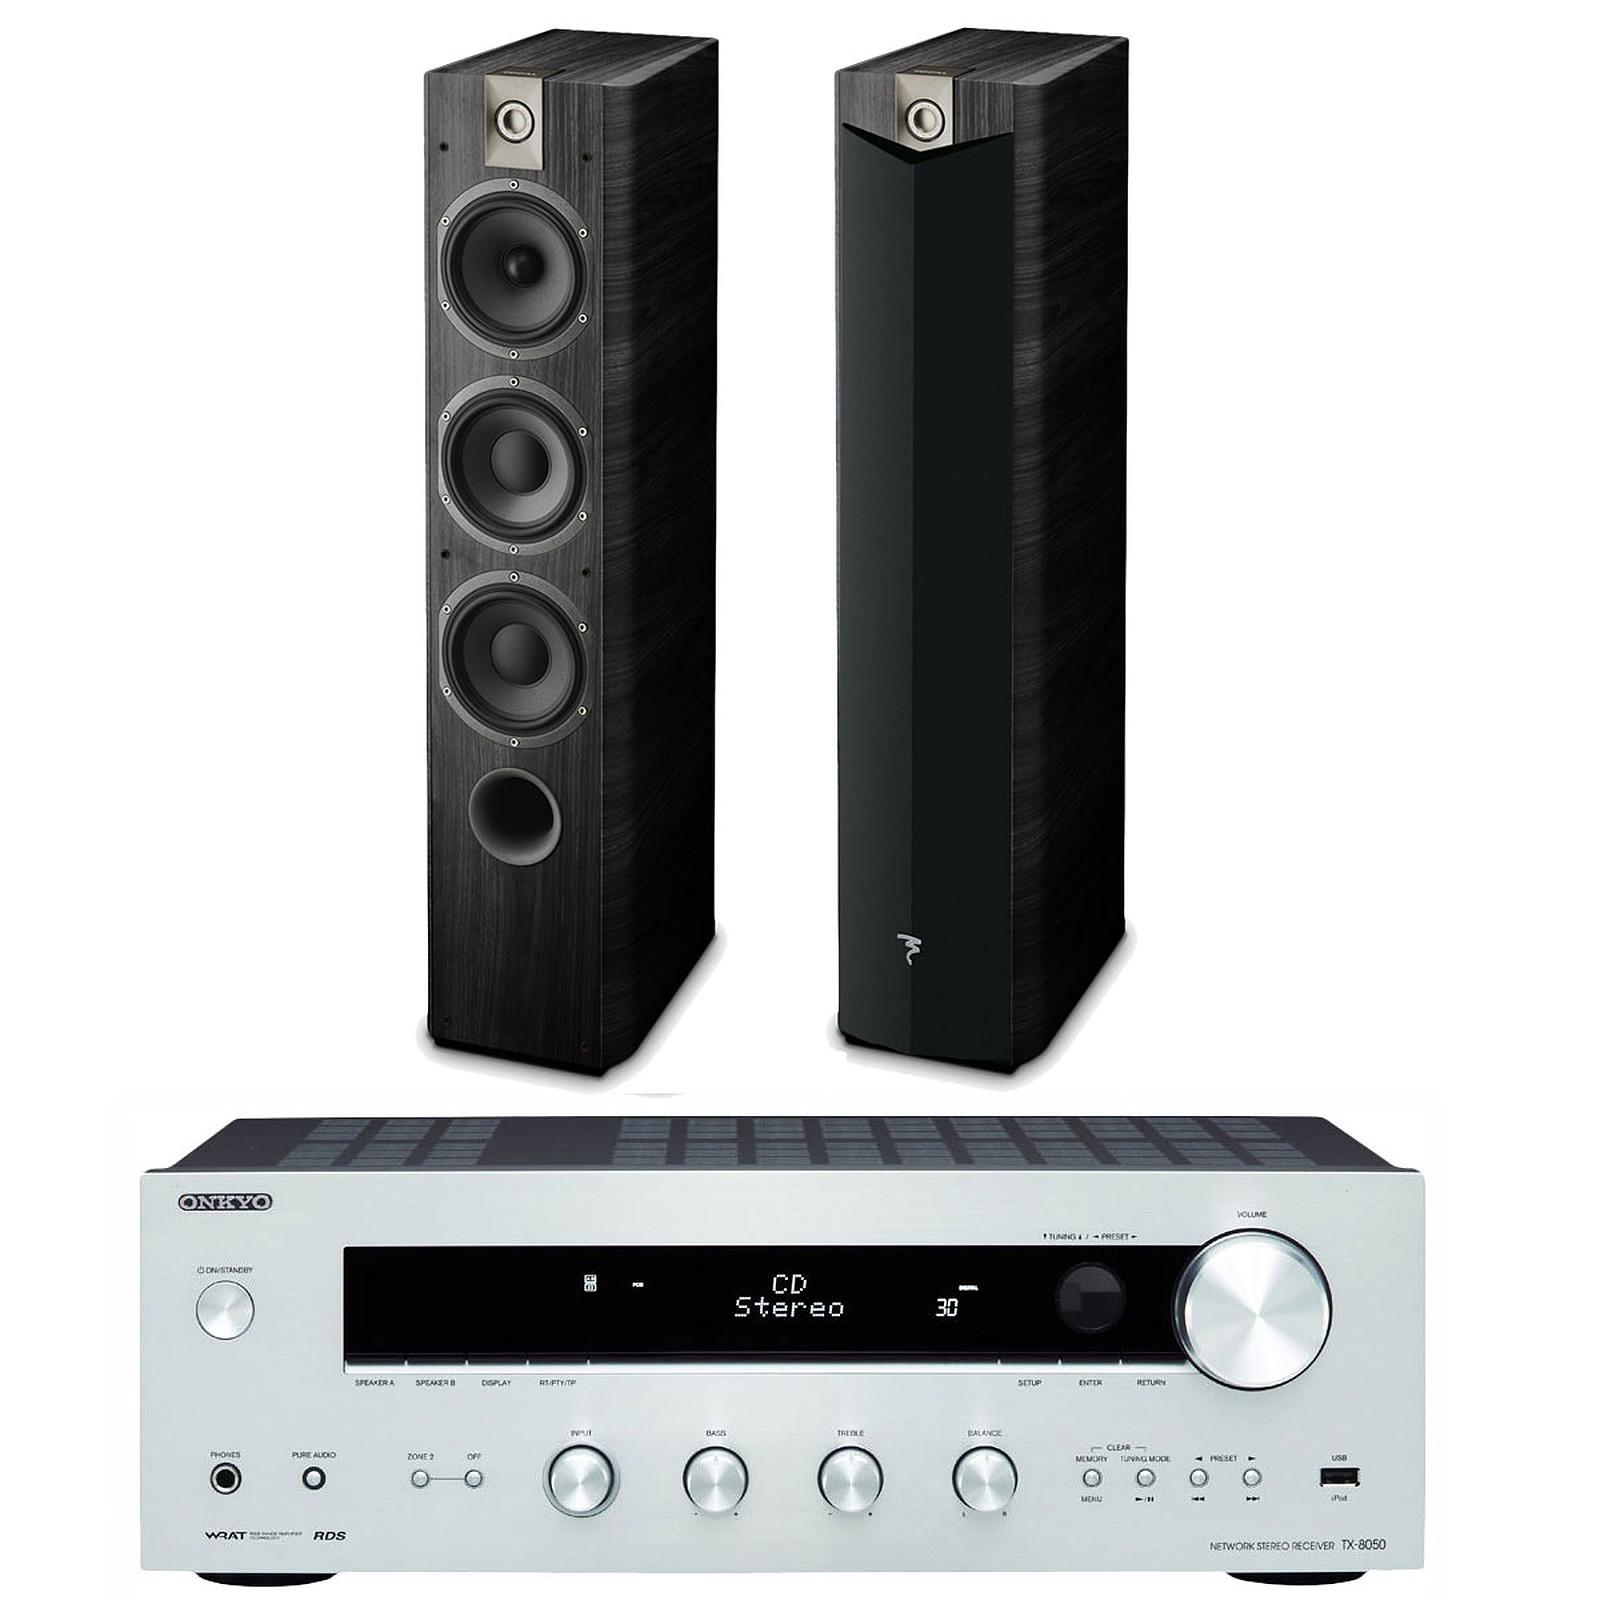 Onkyo TX-8050 Argent + Focal Chorus 727 V2 Black Ash